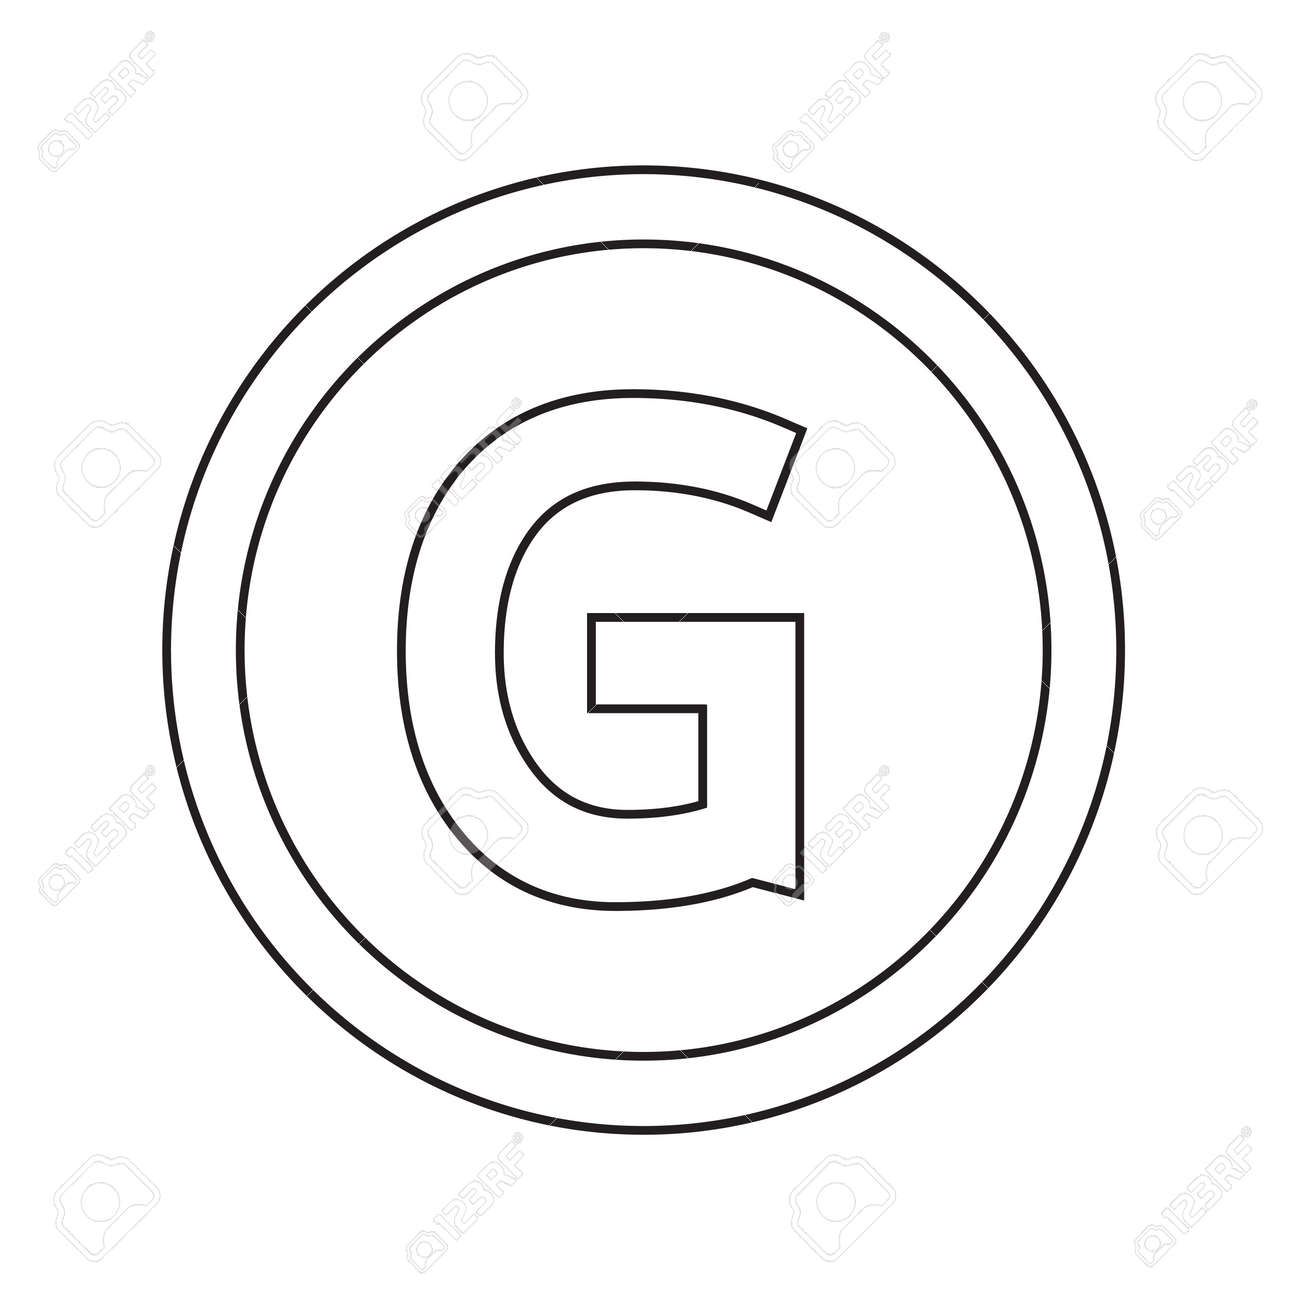 Basic Font For Letter G Icon Illustration Design Royalty Free